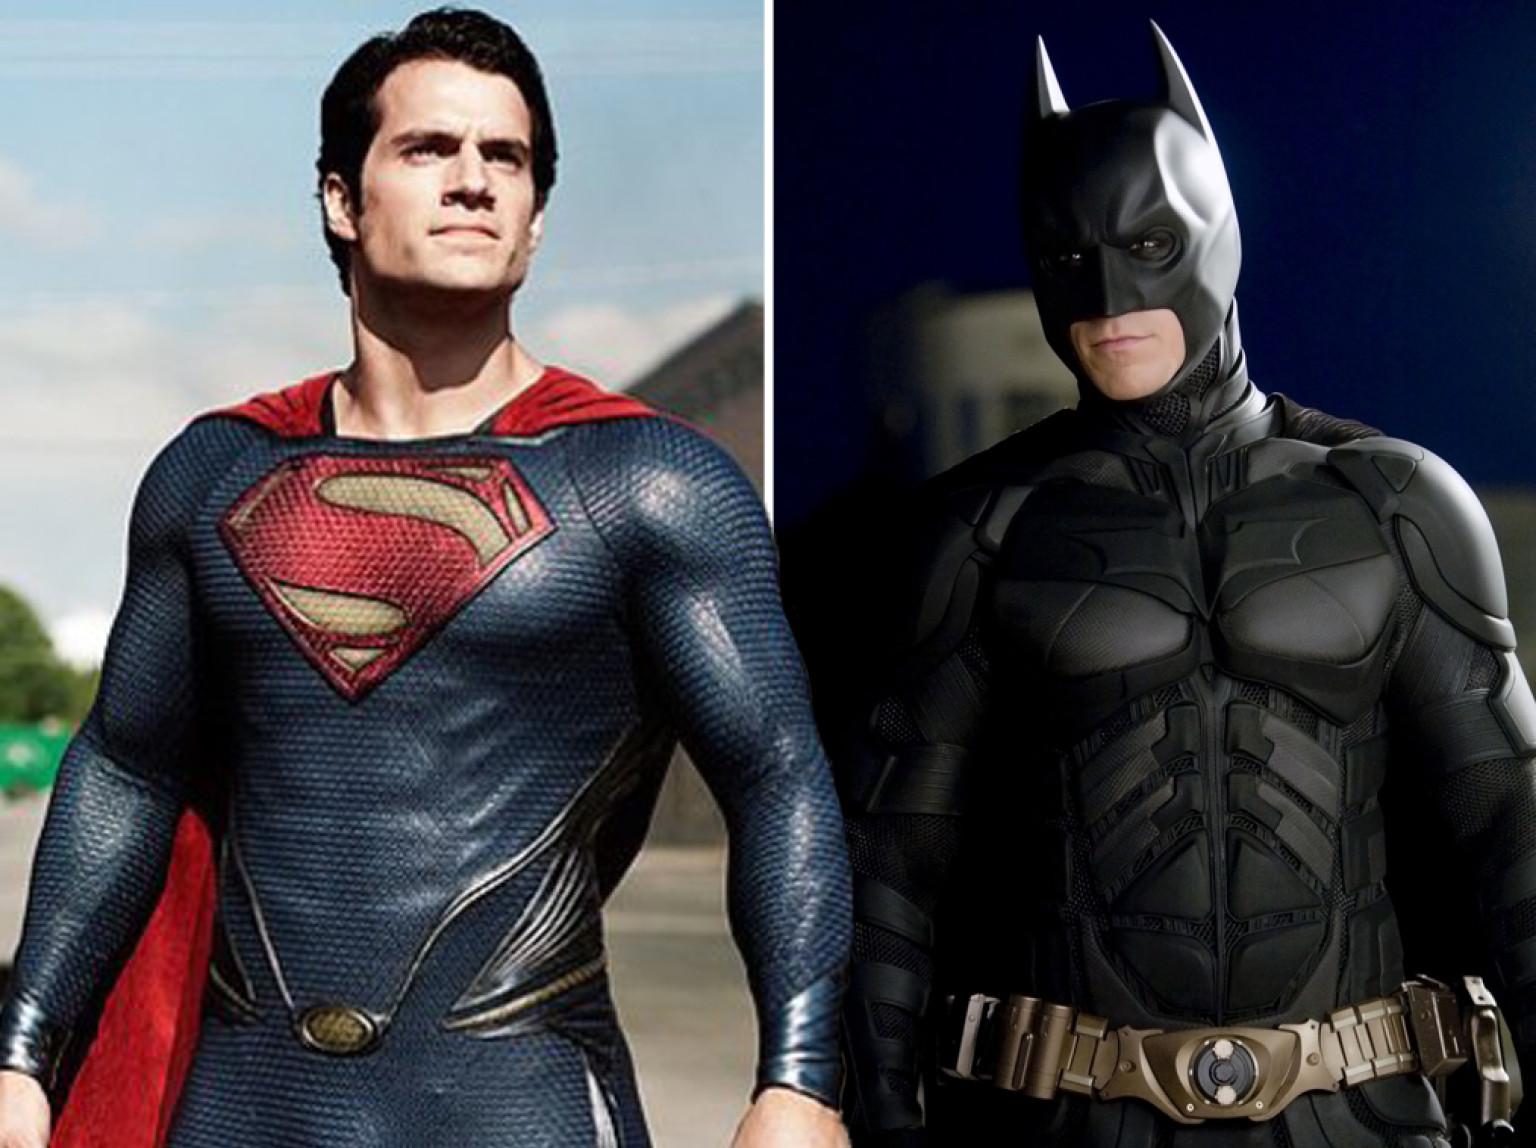 Batman Vs Superman Is a Terrible Idea | HuffPost UK